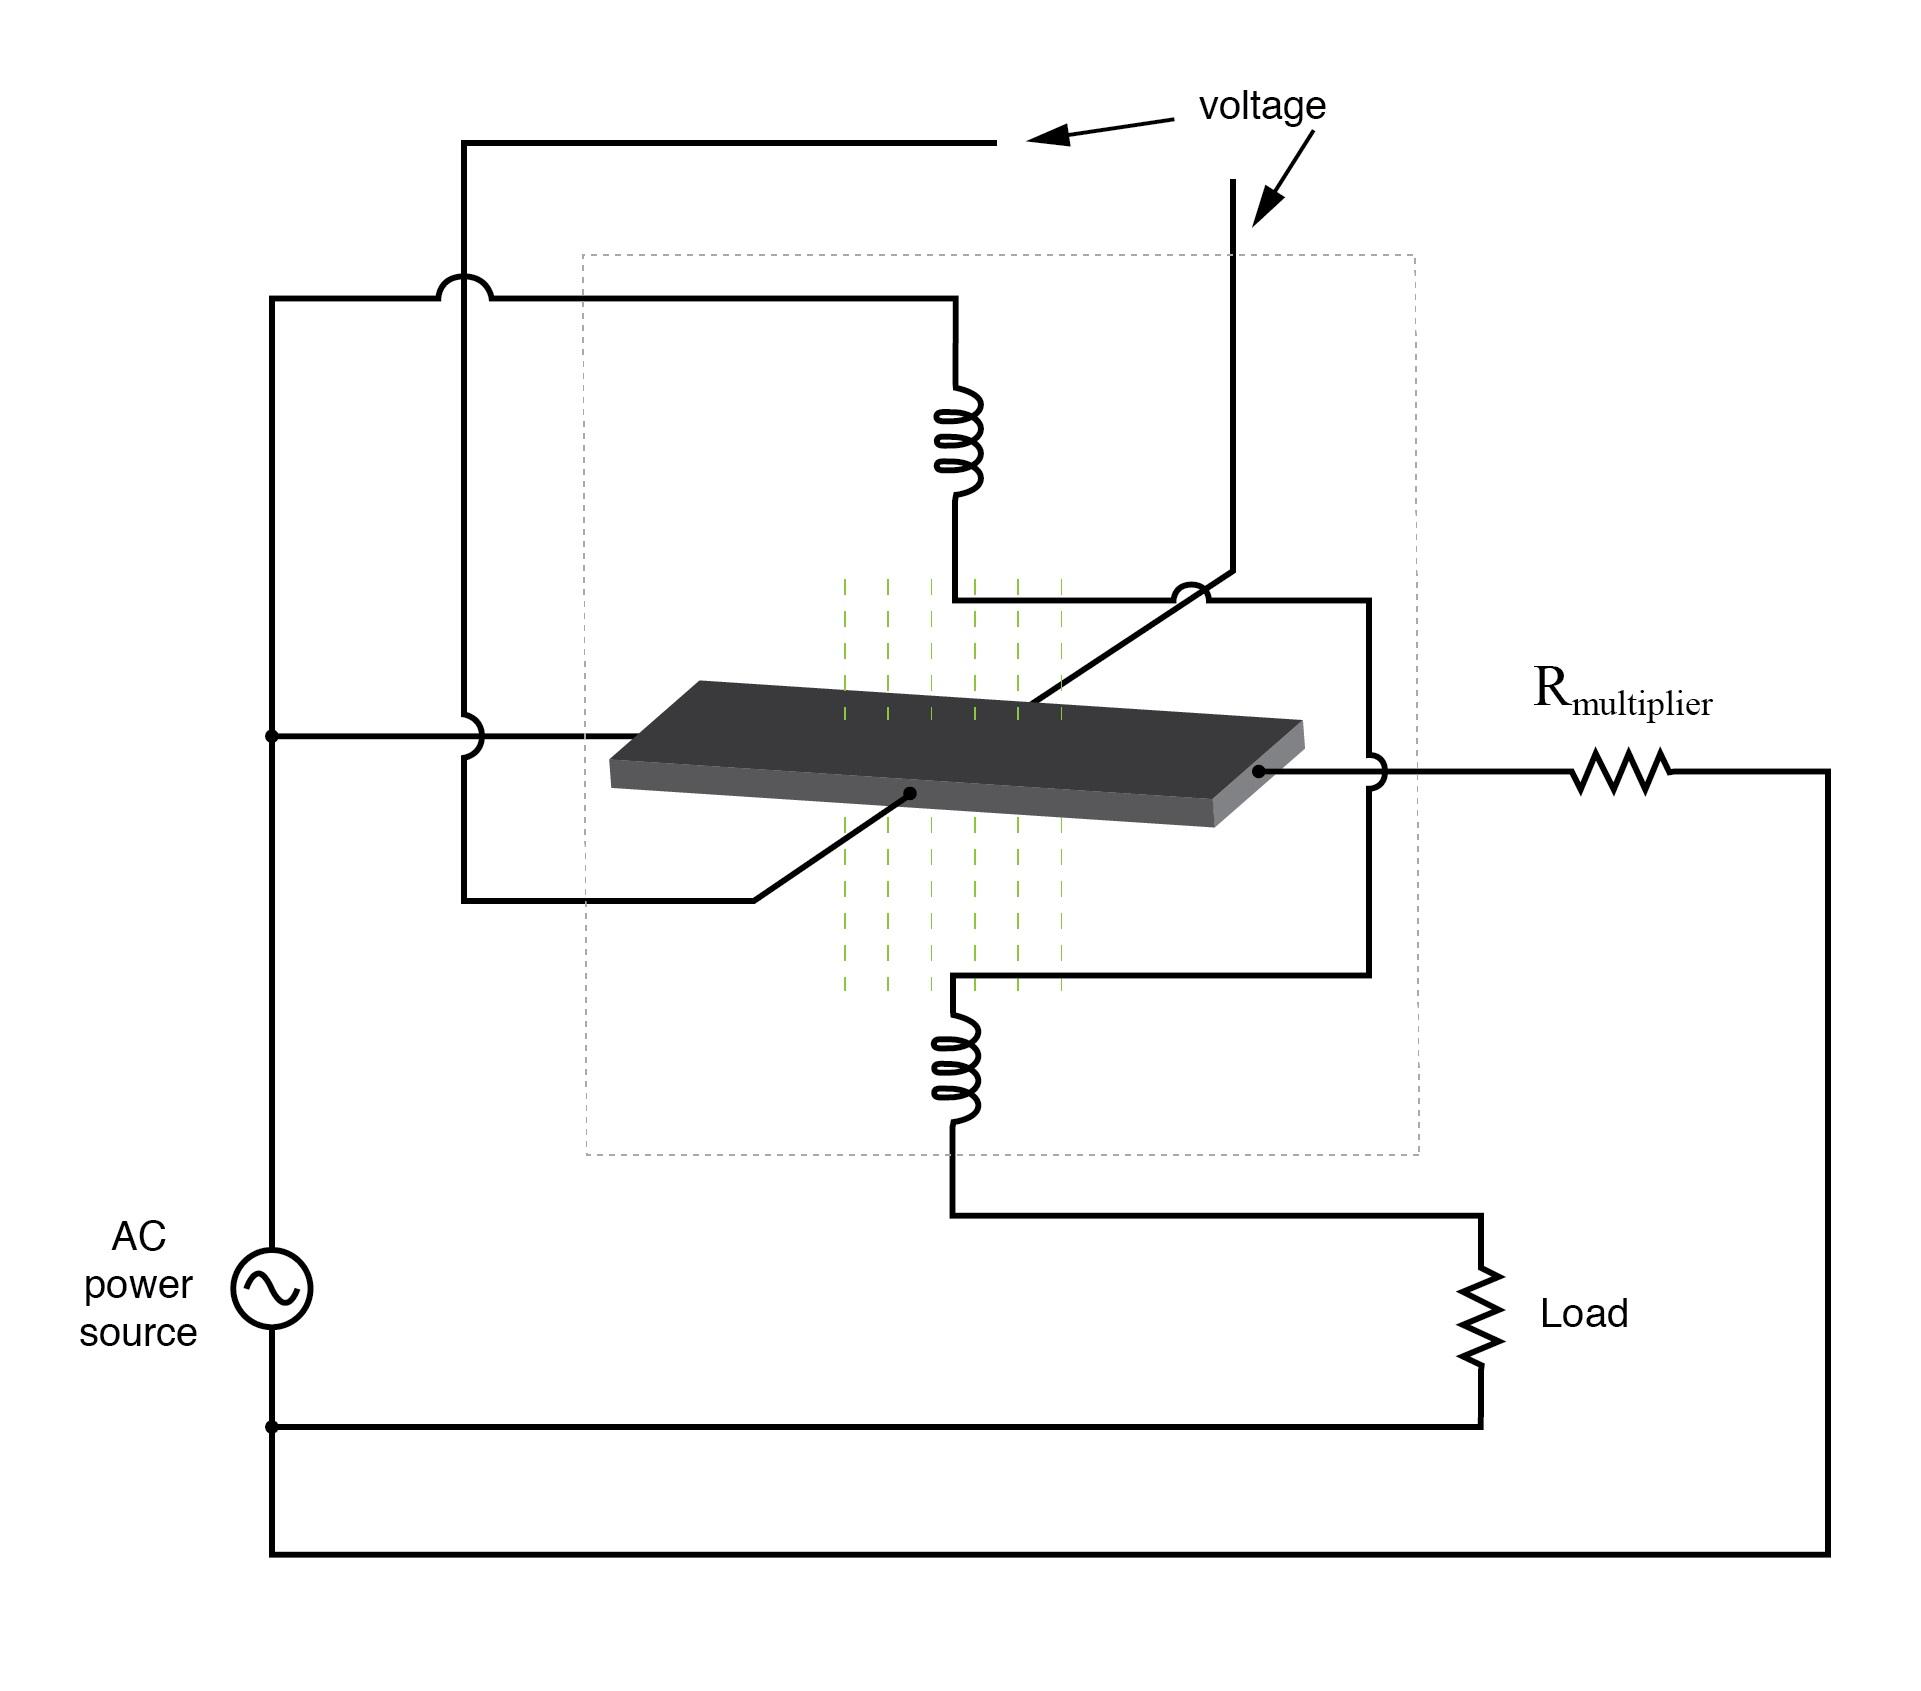 Hall effect power sensor measures instantaneous power.